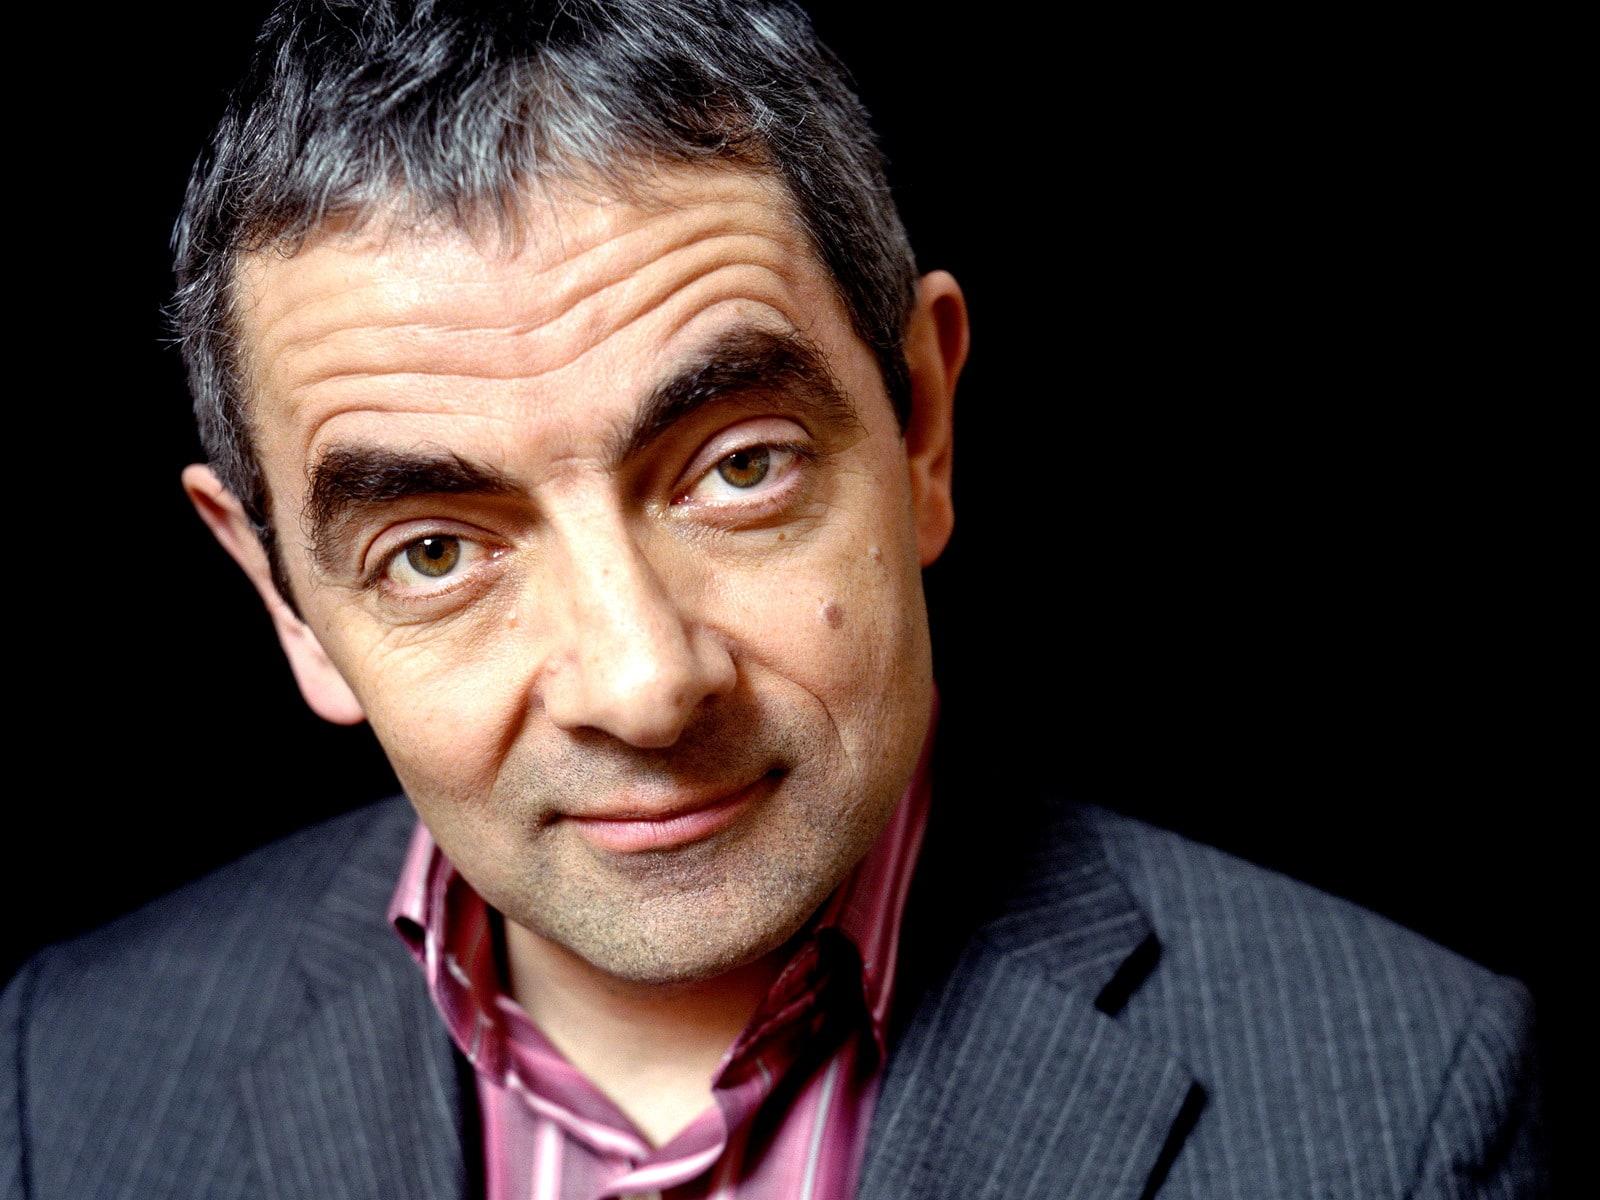 Rowan Atkinson Pictures